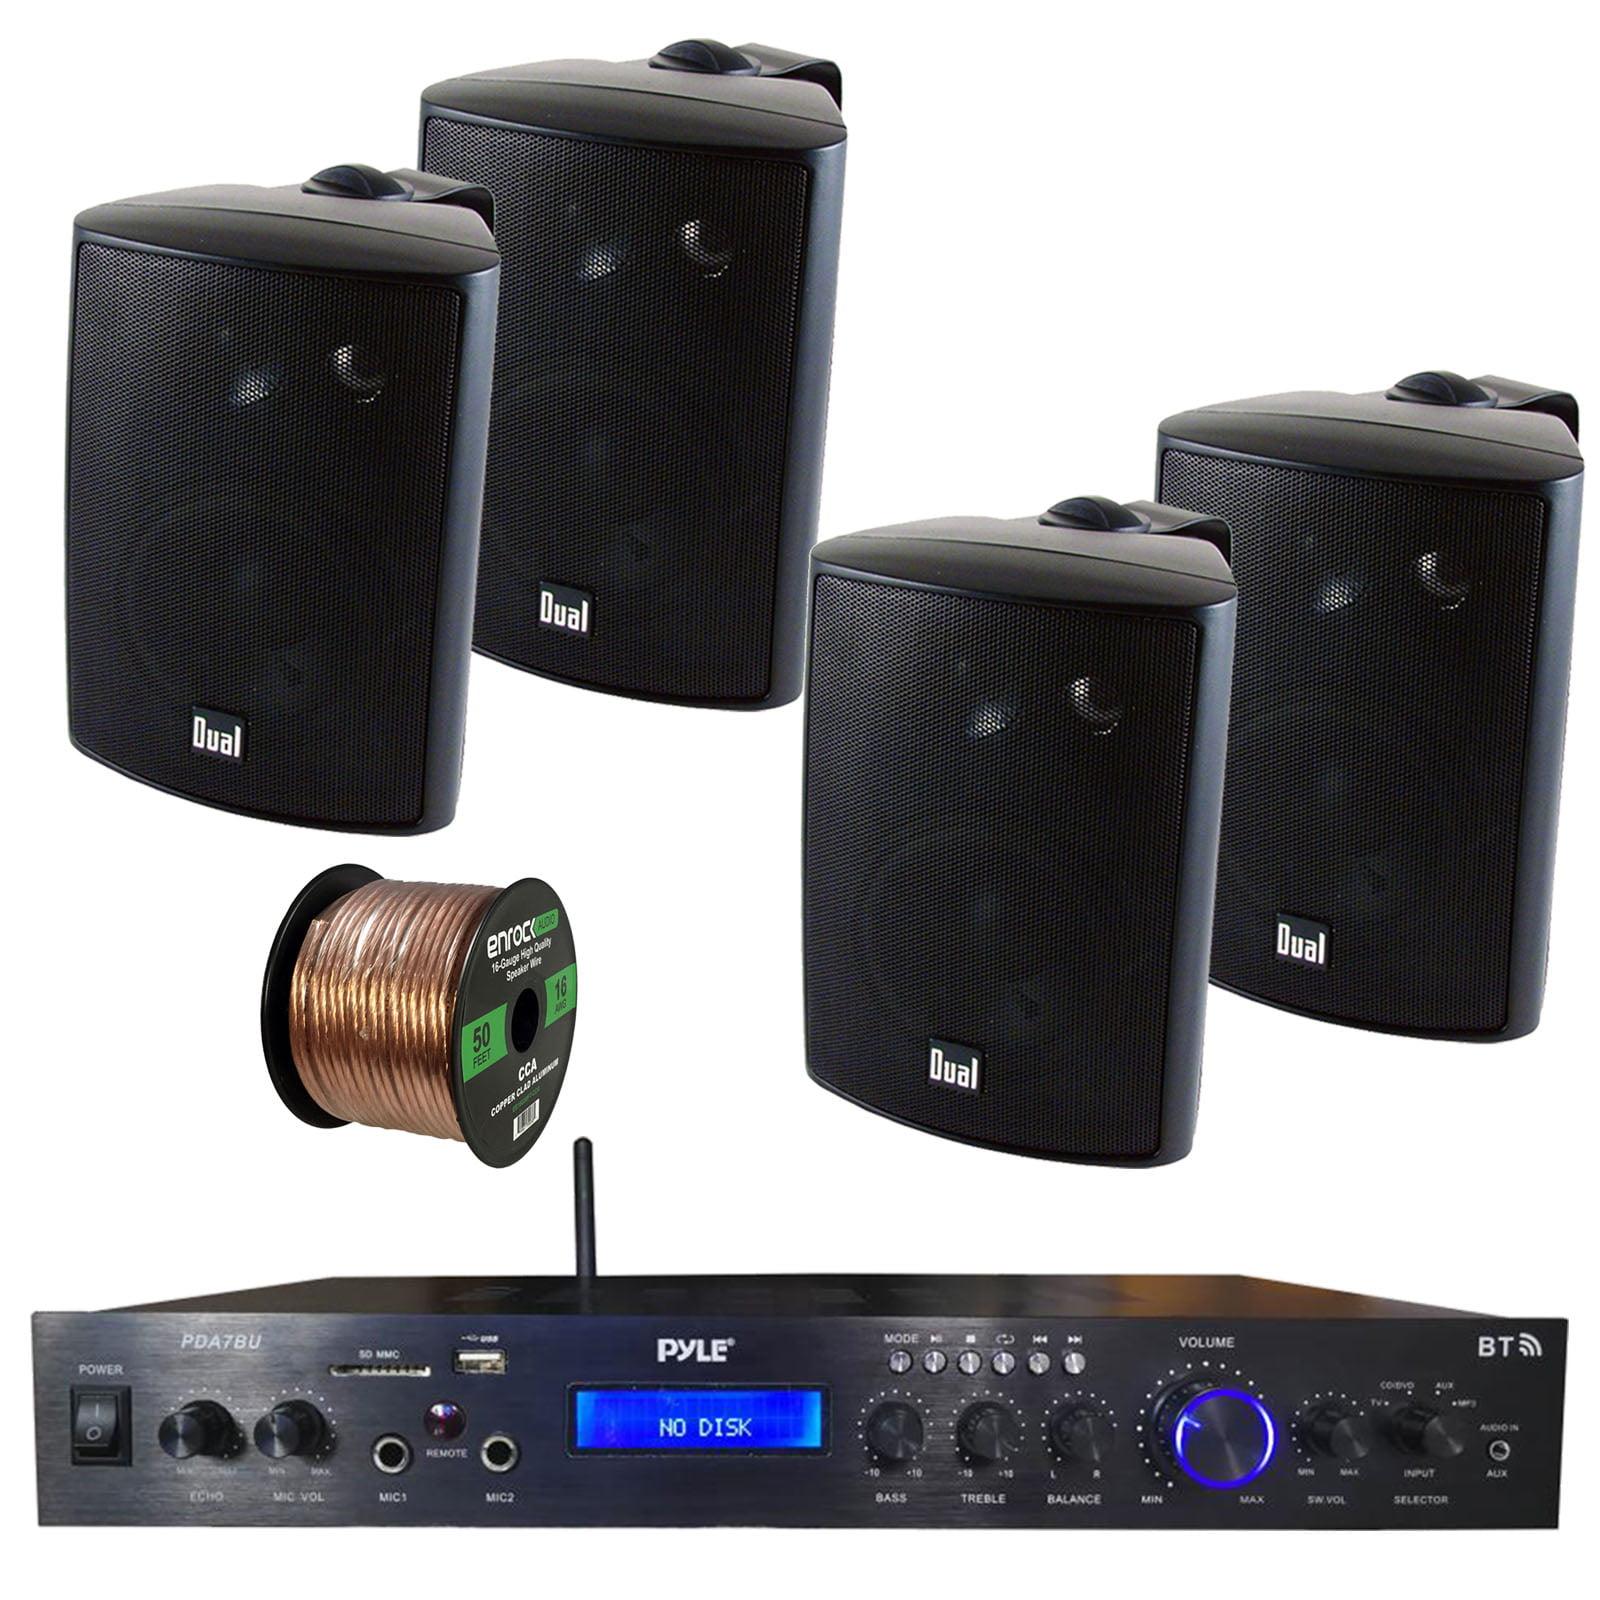 Pyle Home Theater Amplifier Audio Bluetooth MP3/USB/SD/AUX/FM Black Receiver Sound System, with 4x Dual 100 Watt 3 Way Indoor Outdoor Studio White Speakers, Enrock Audio 16-Gauge 50 Foot Speaker Wire